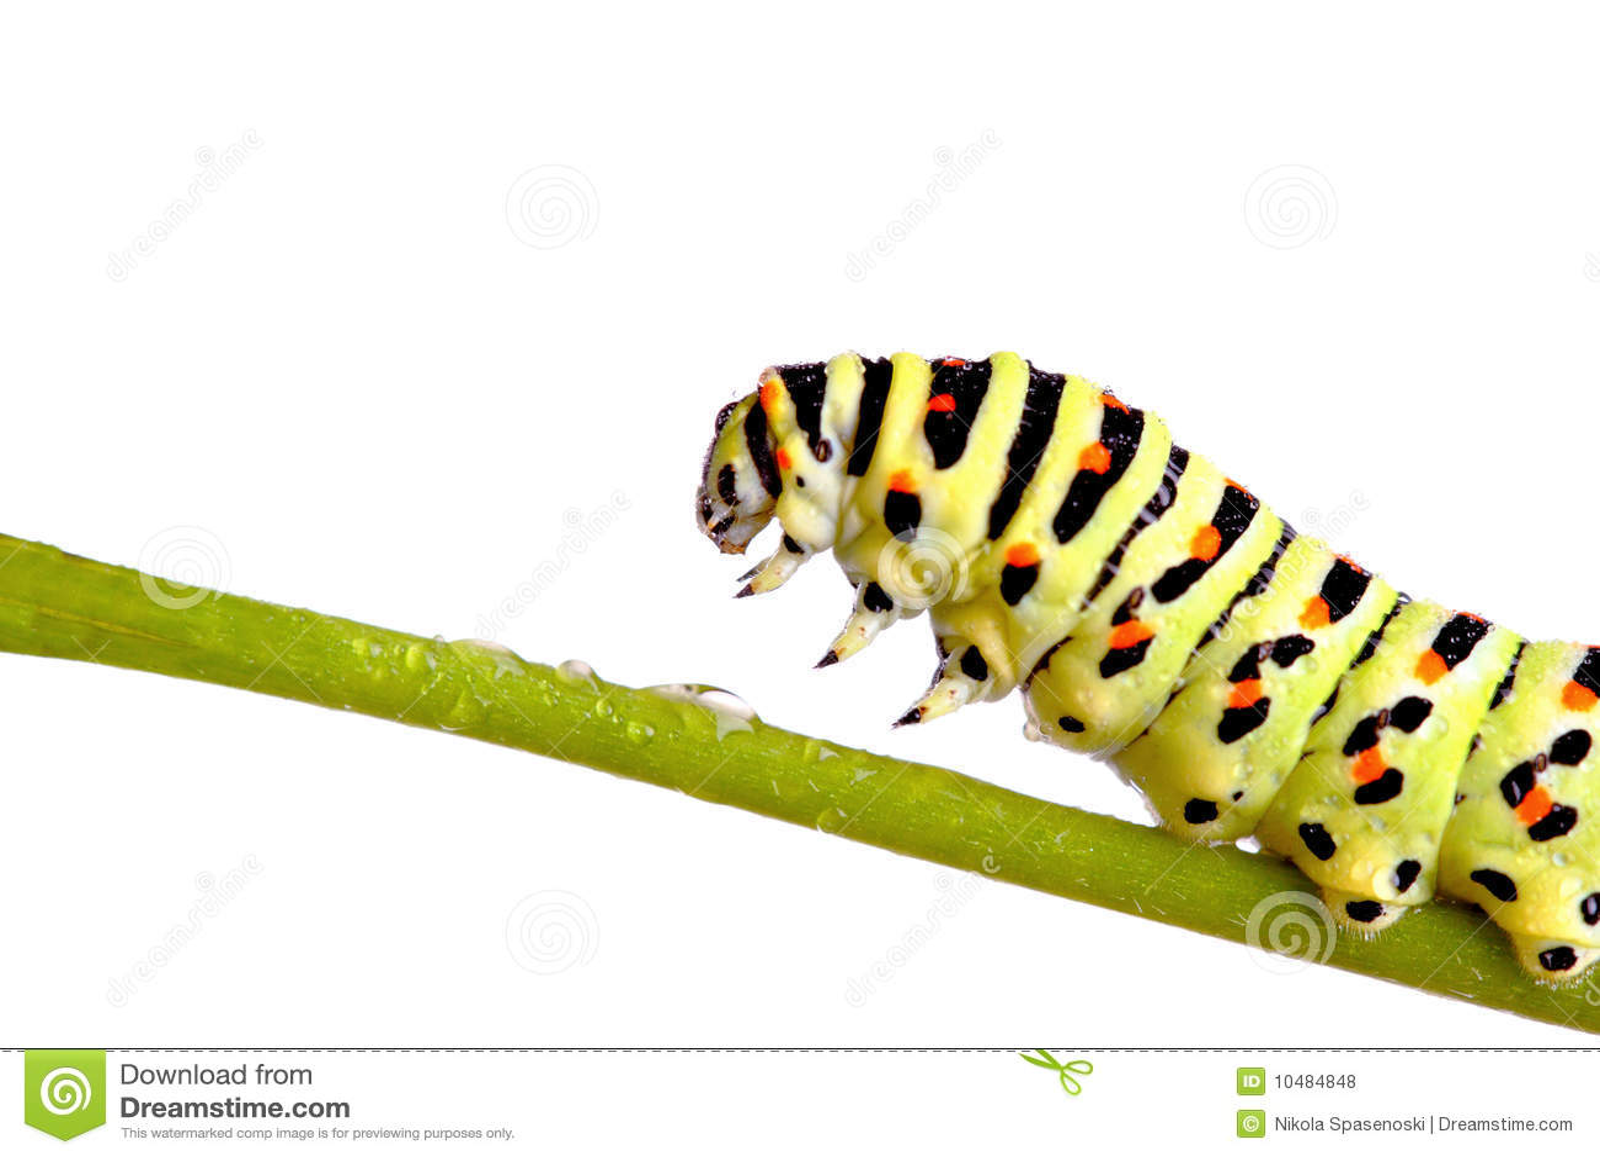 Swallowtail vert de tracteur à chenilles